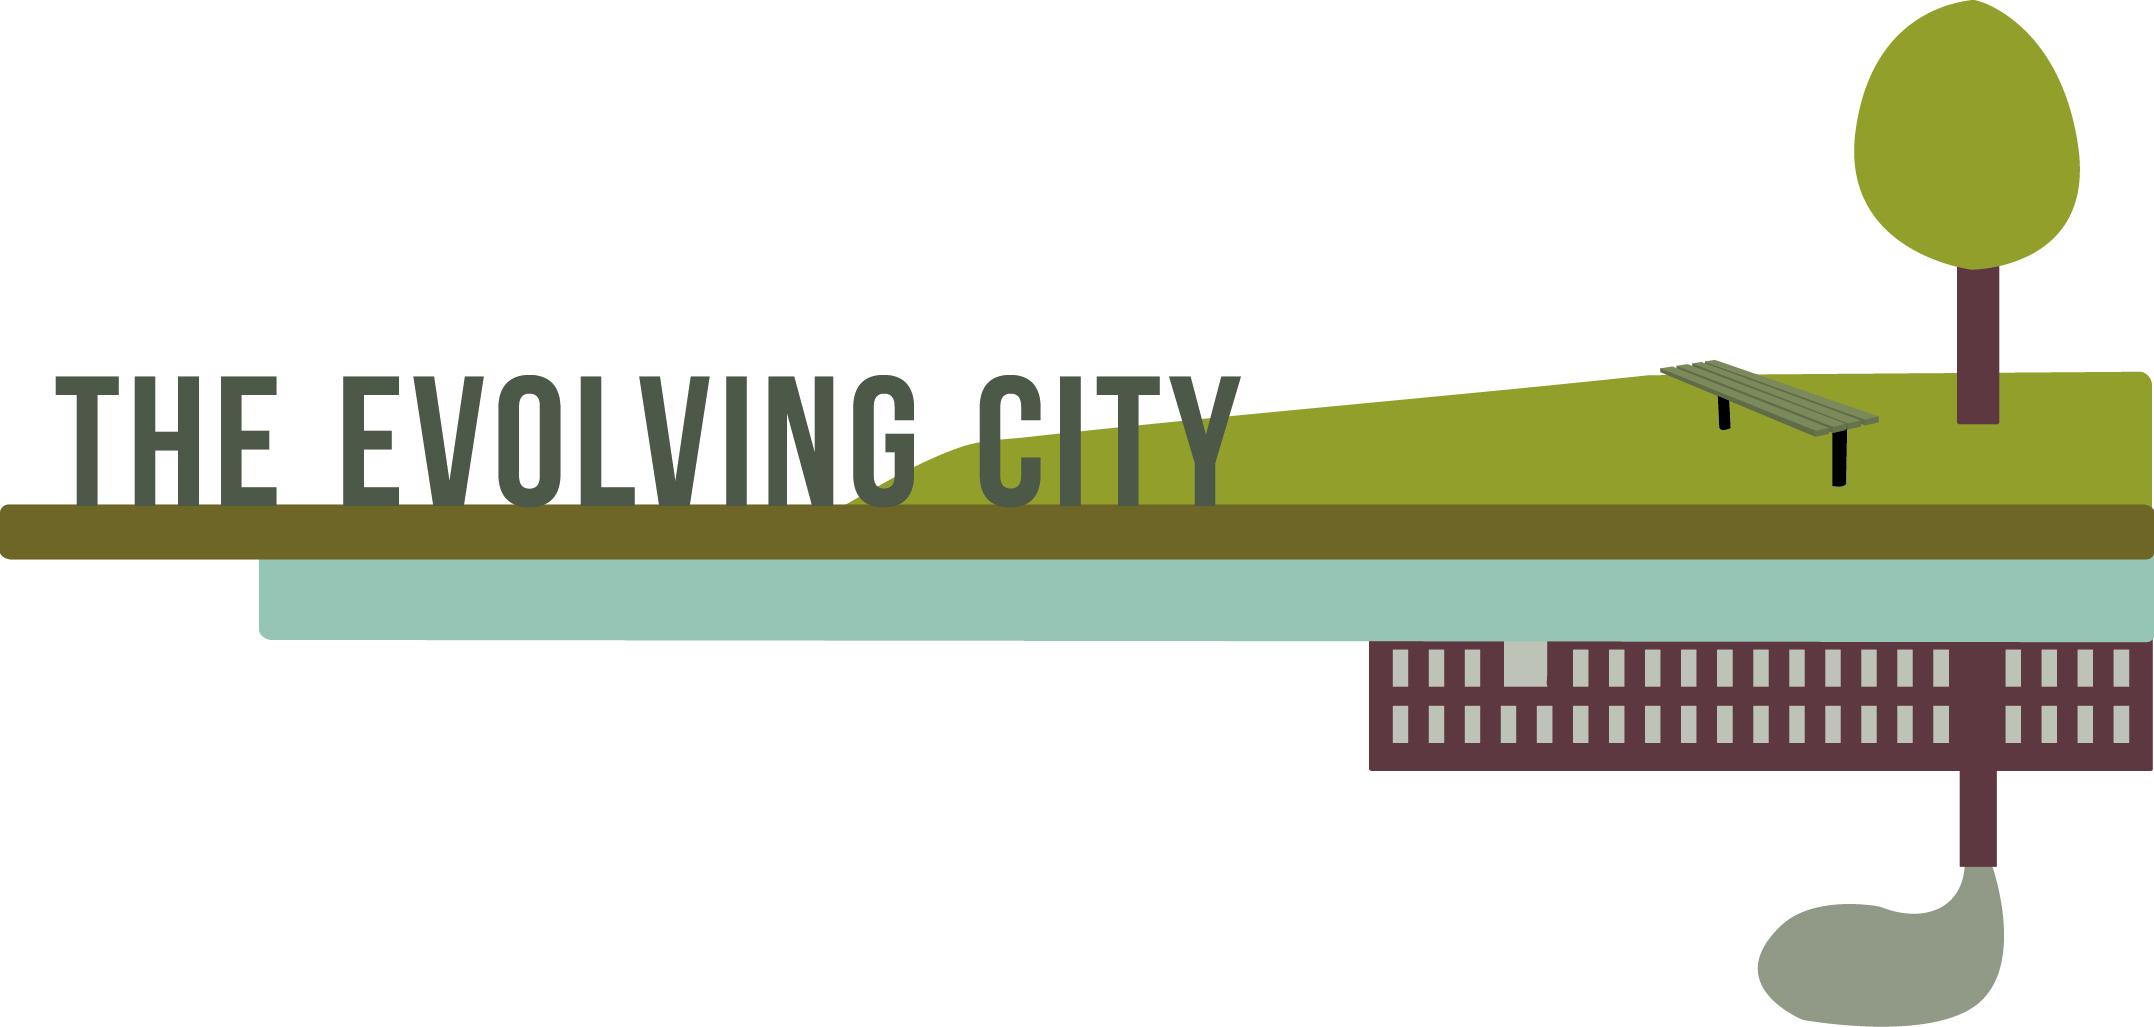 The Evolving City